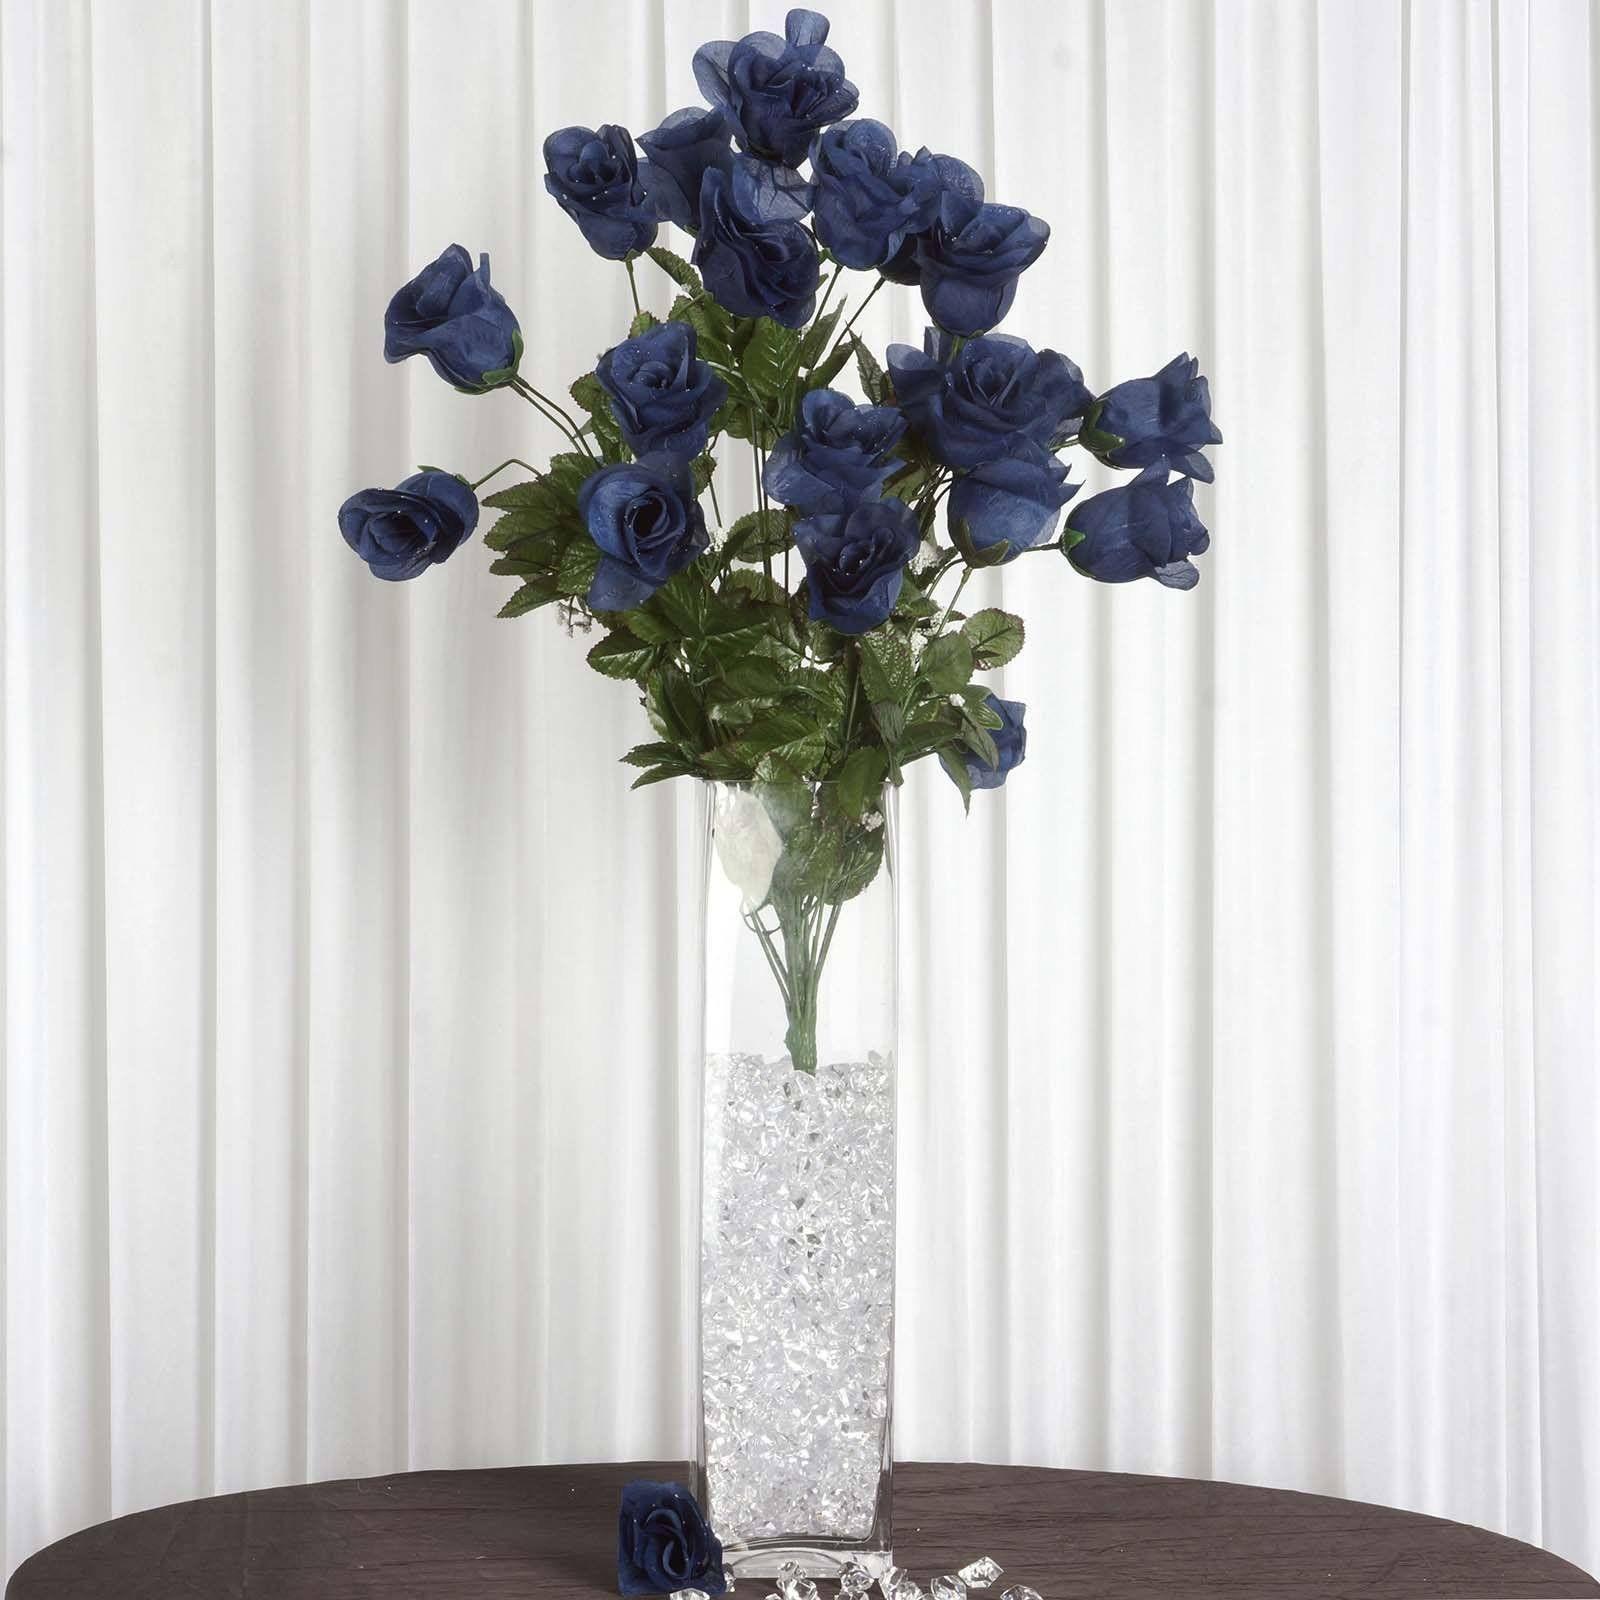 96 Wholesale Artificial Giant Rose Bud Wedding Bouquet Vase ...